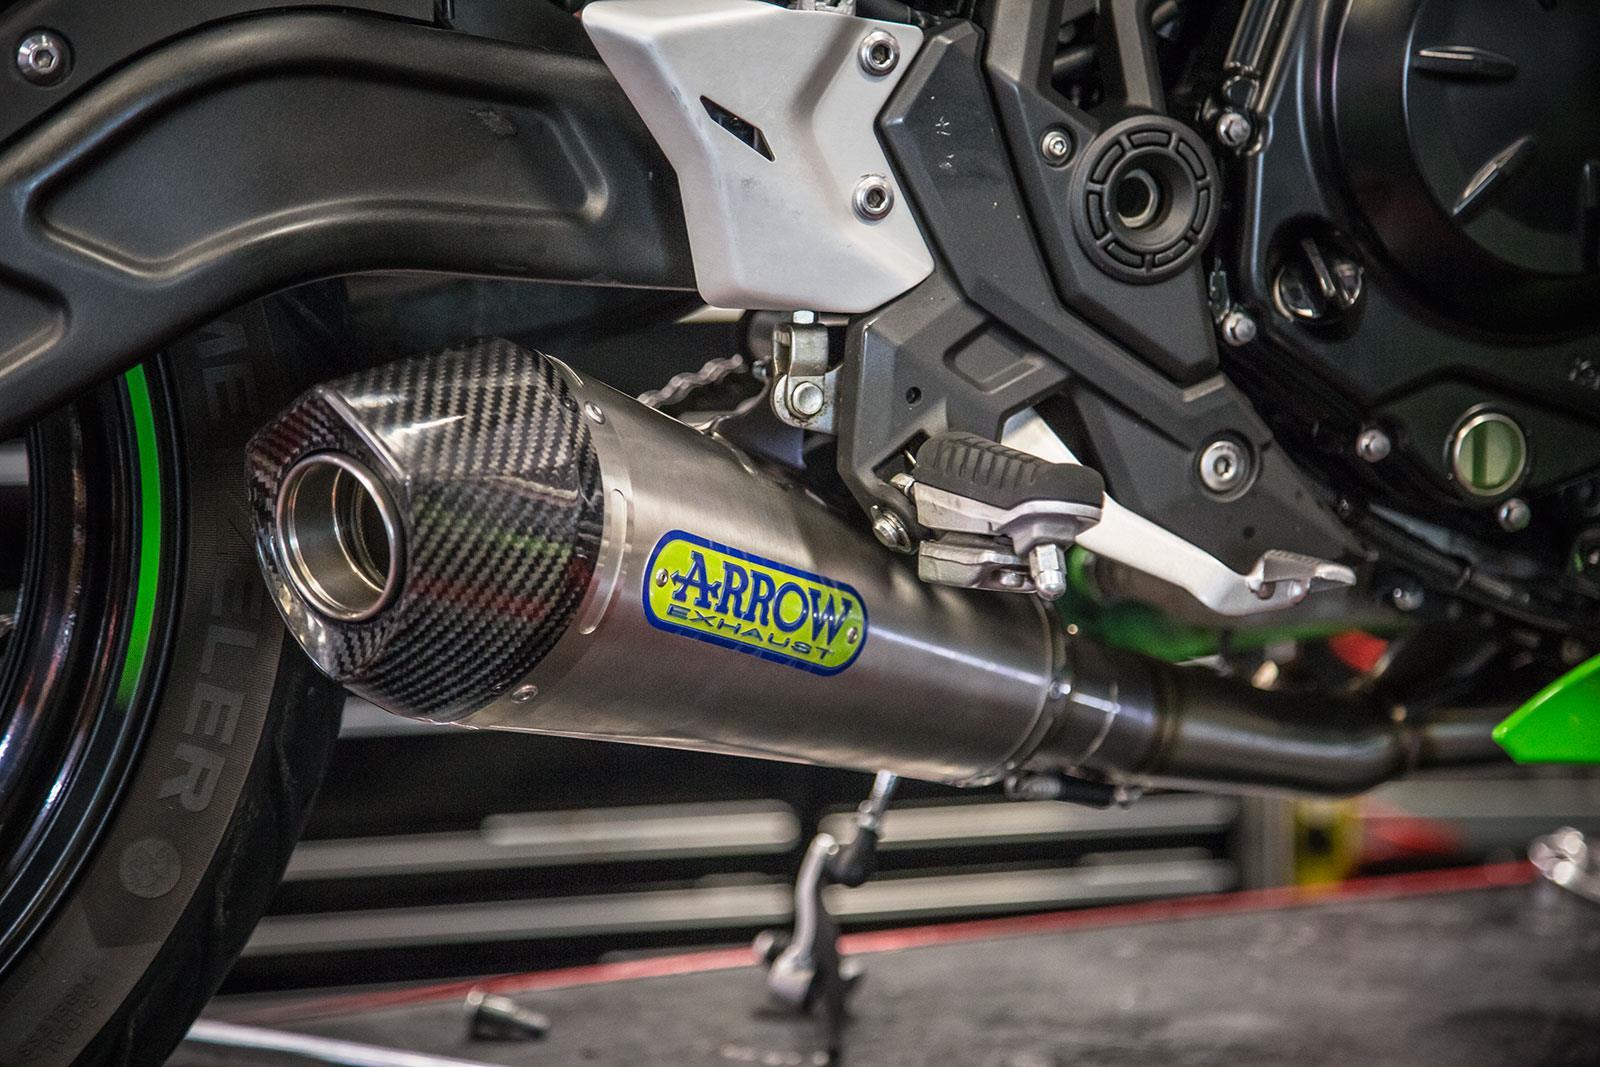 Kawasaki Ninja650 Arrow exhaust system